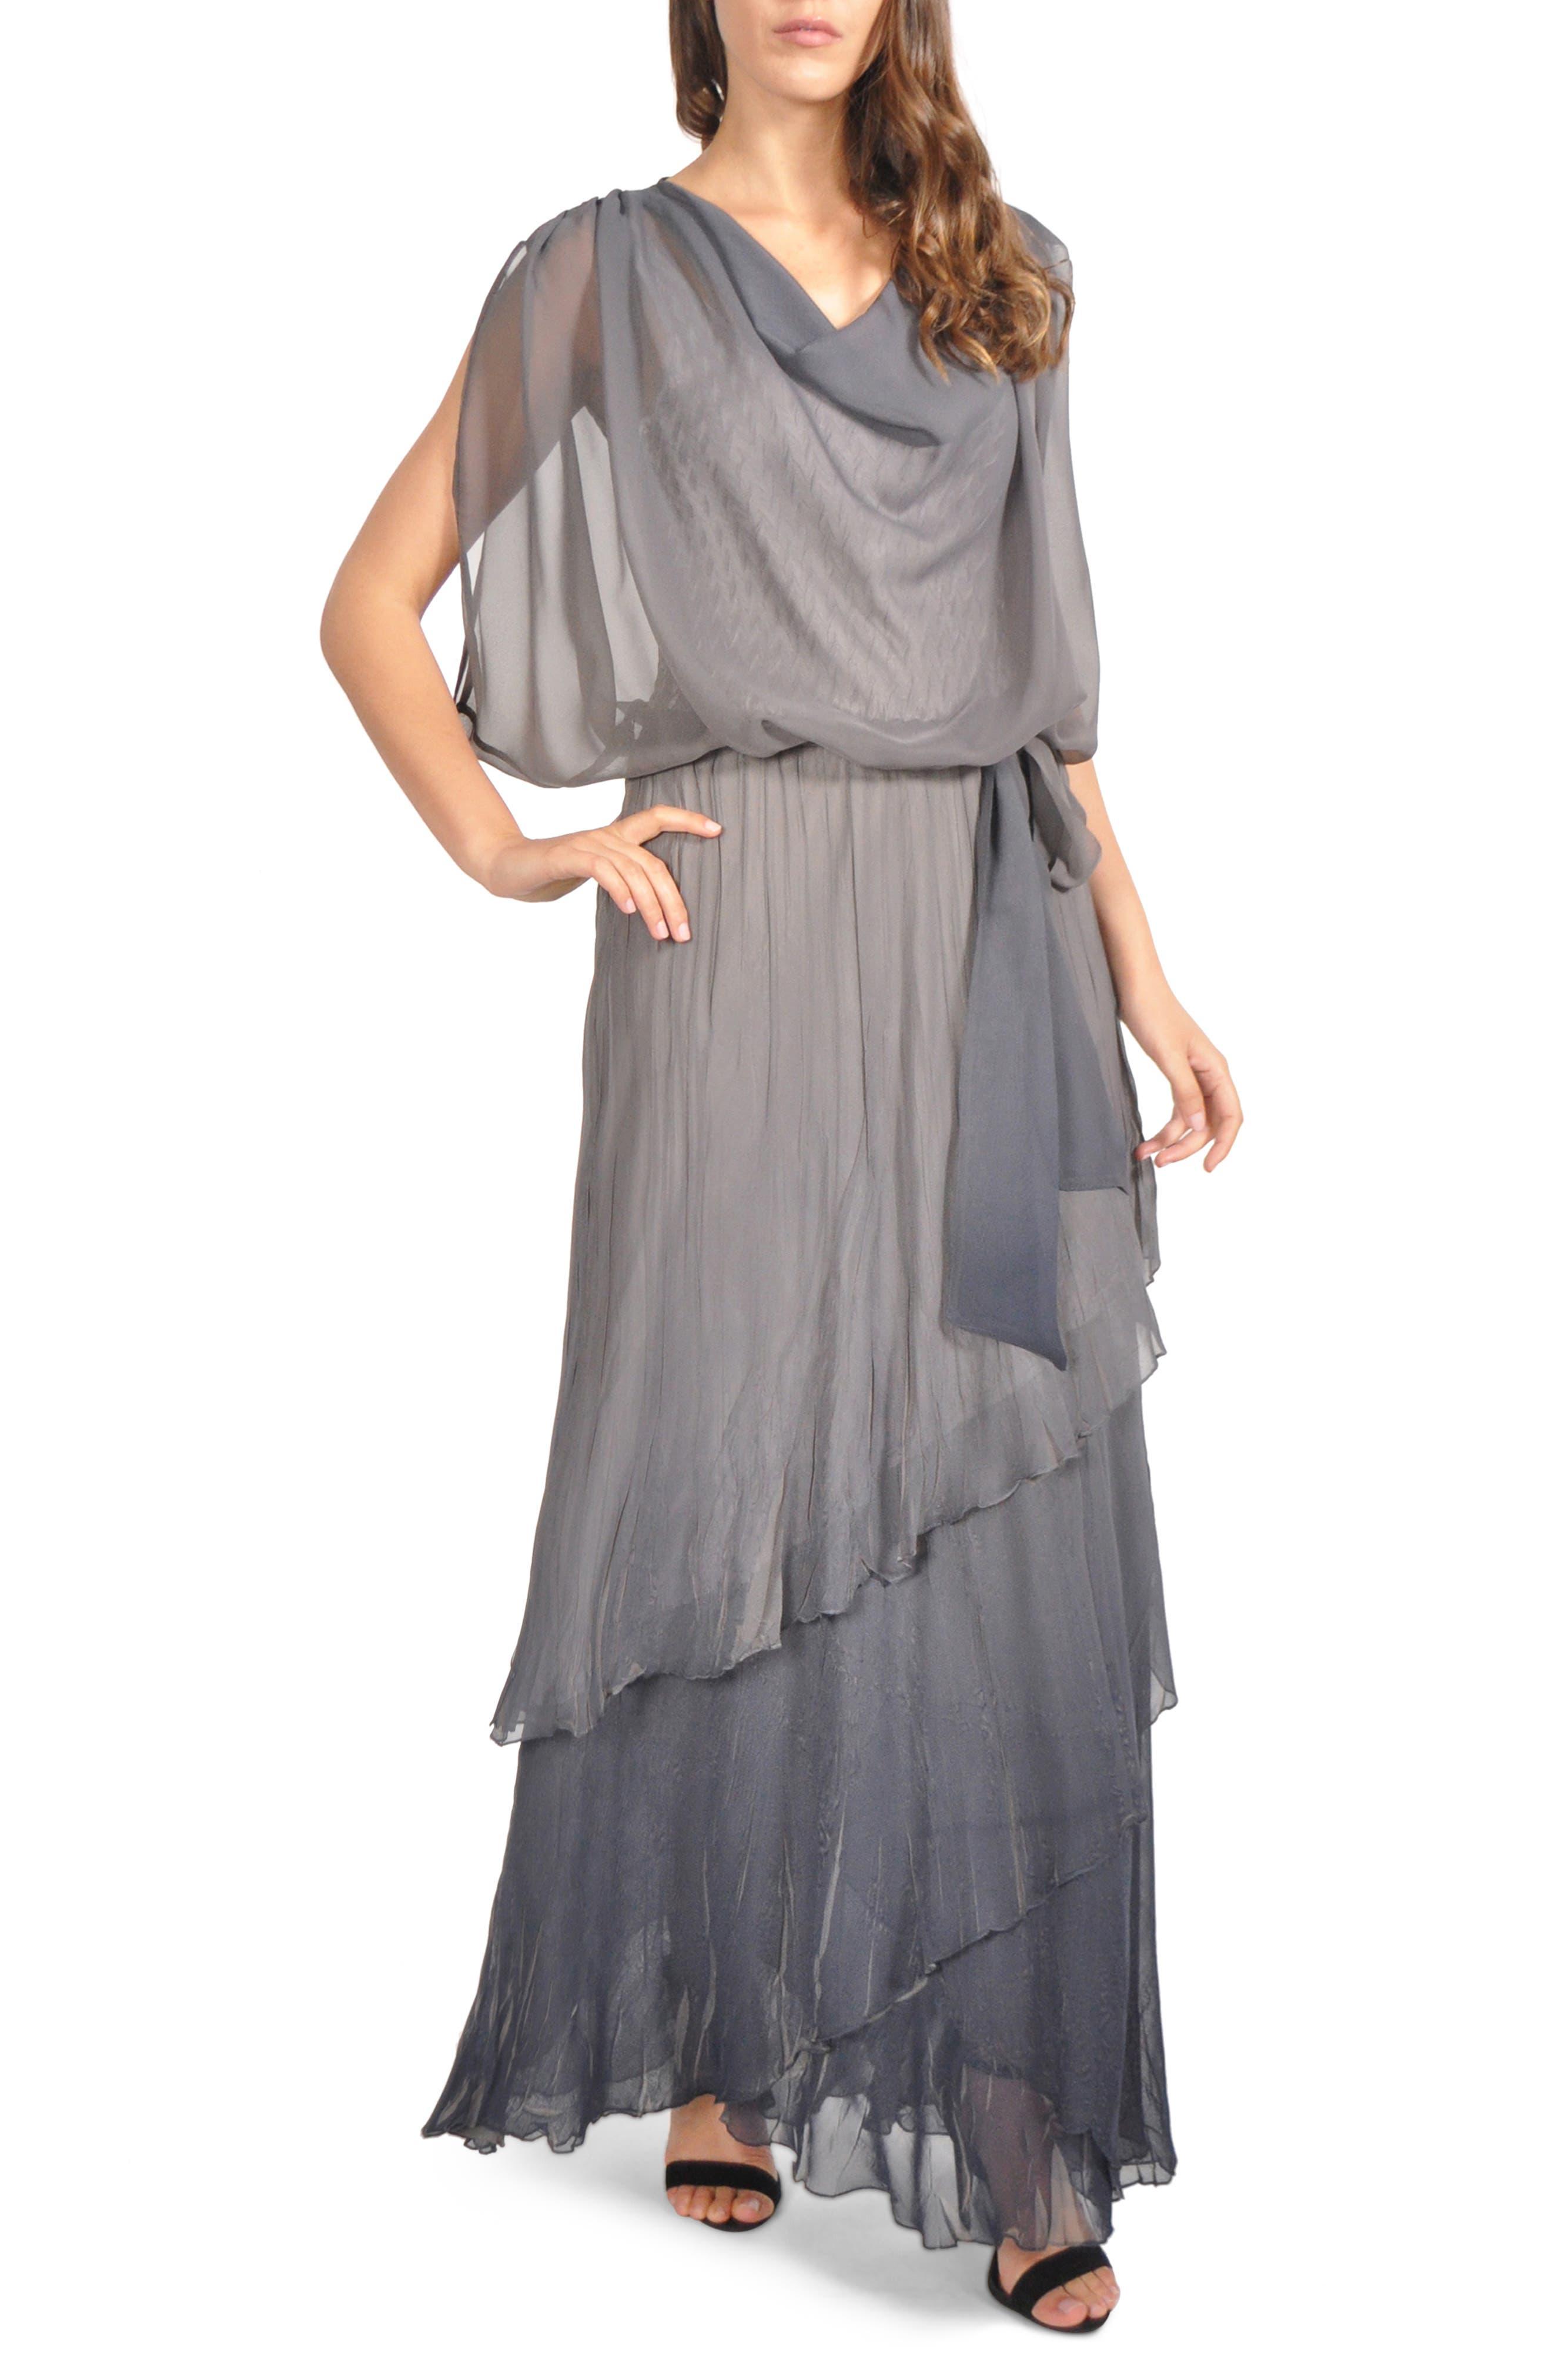 1900 Edwardian Dresses, Tea Party Dresses, White Lace Dresses Womens Komarov Drape Chiffon Gown $480.00 AT vintagedancer.com